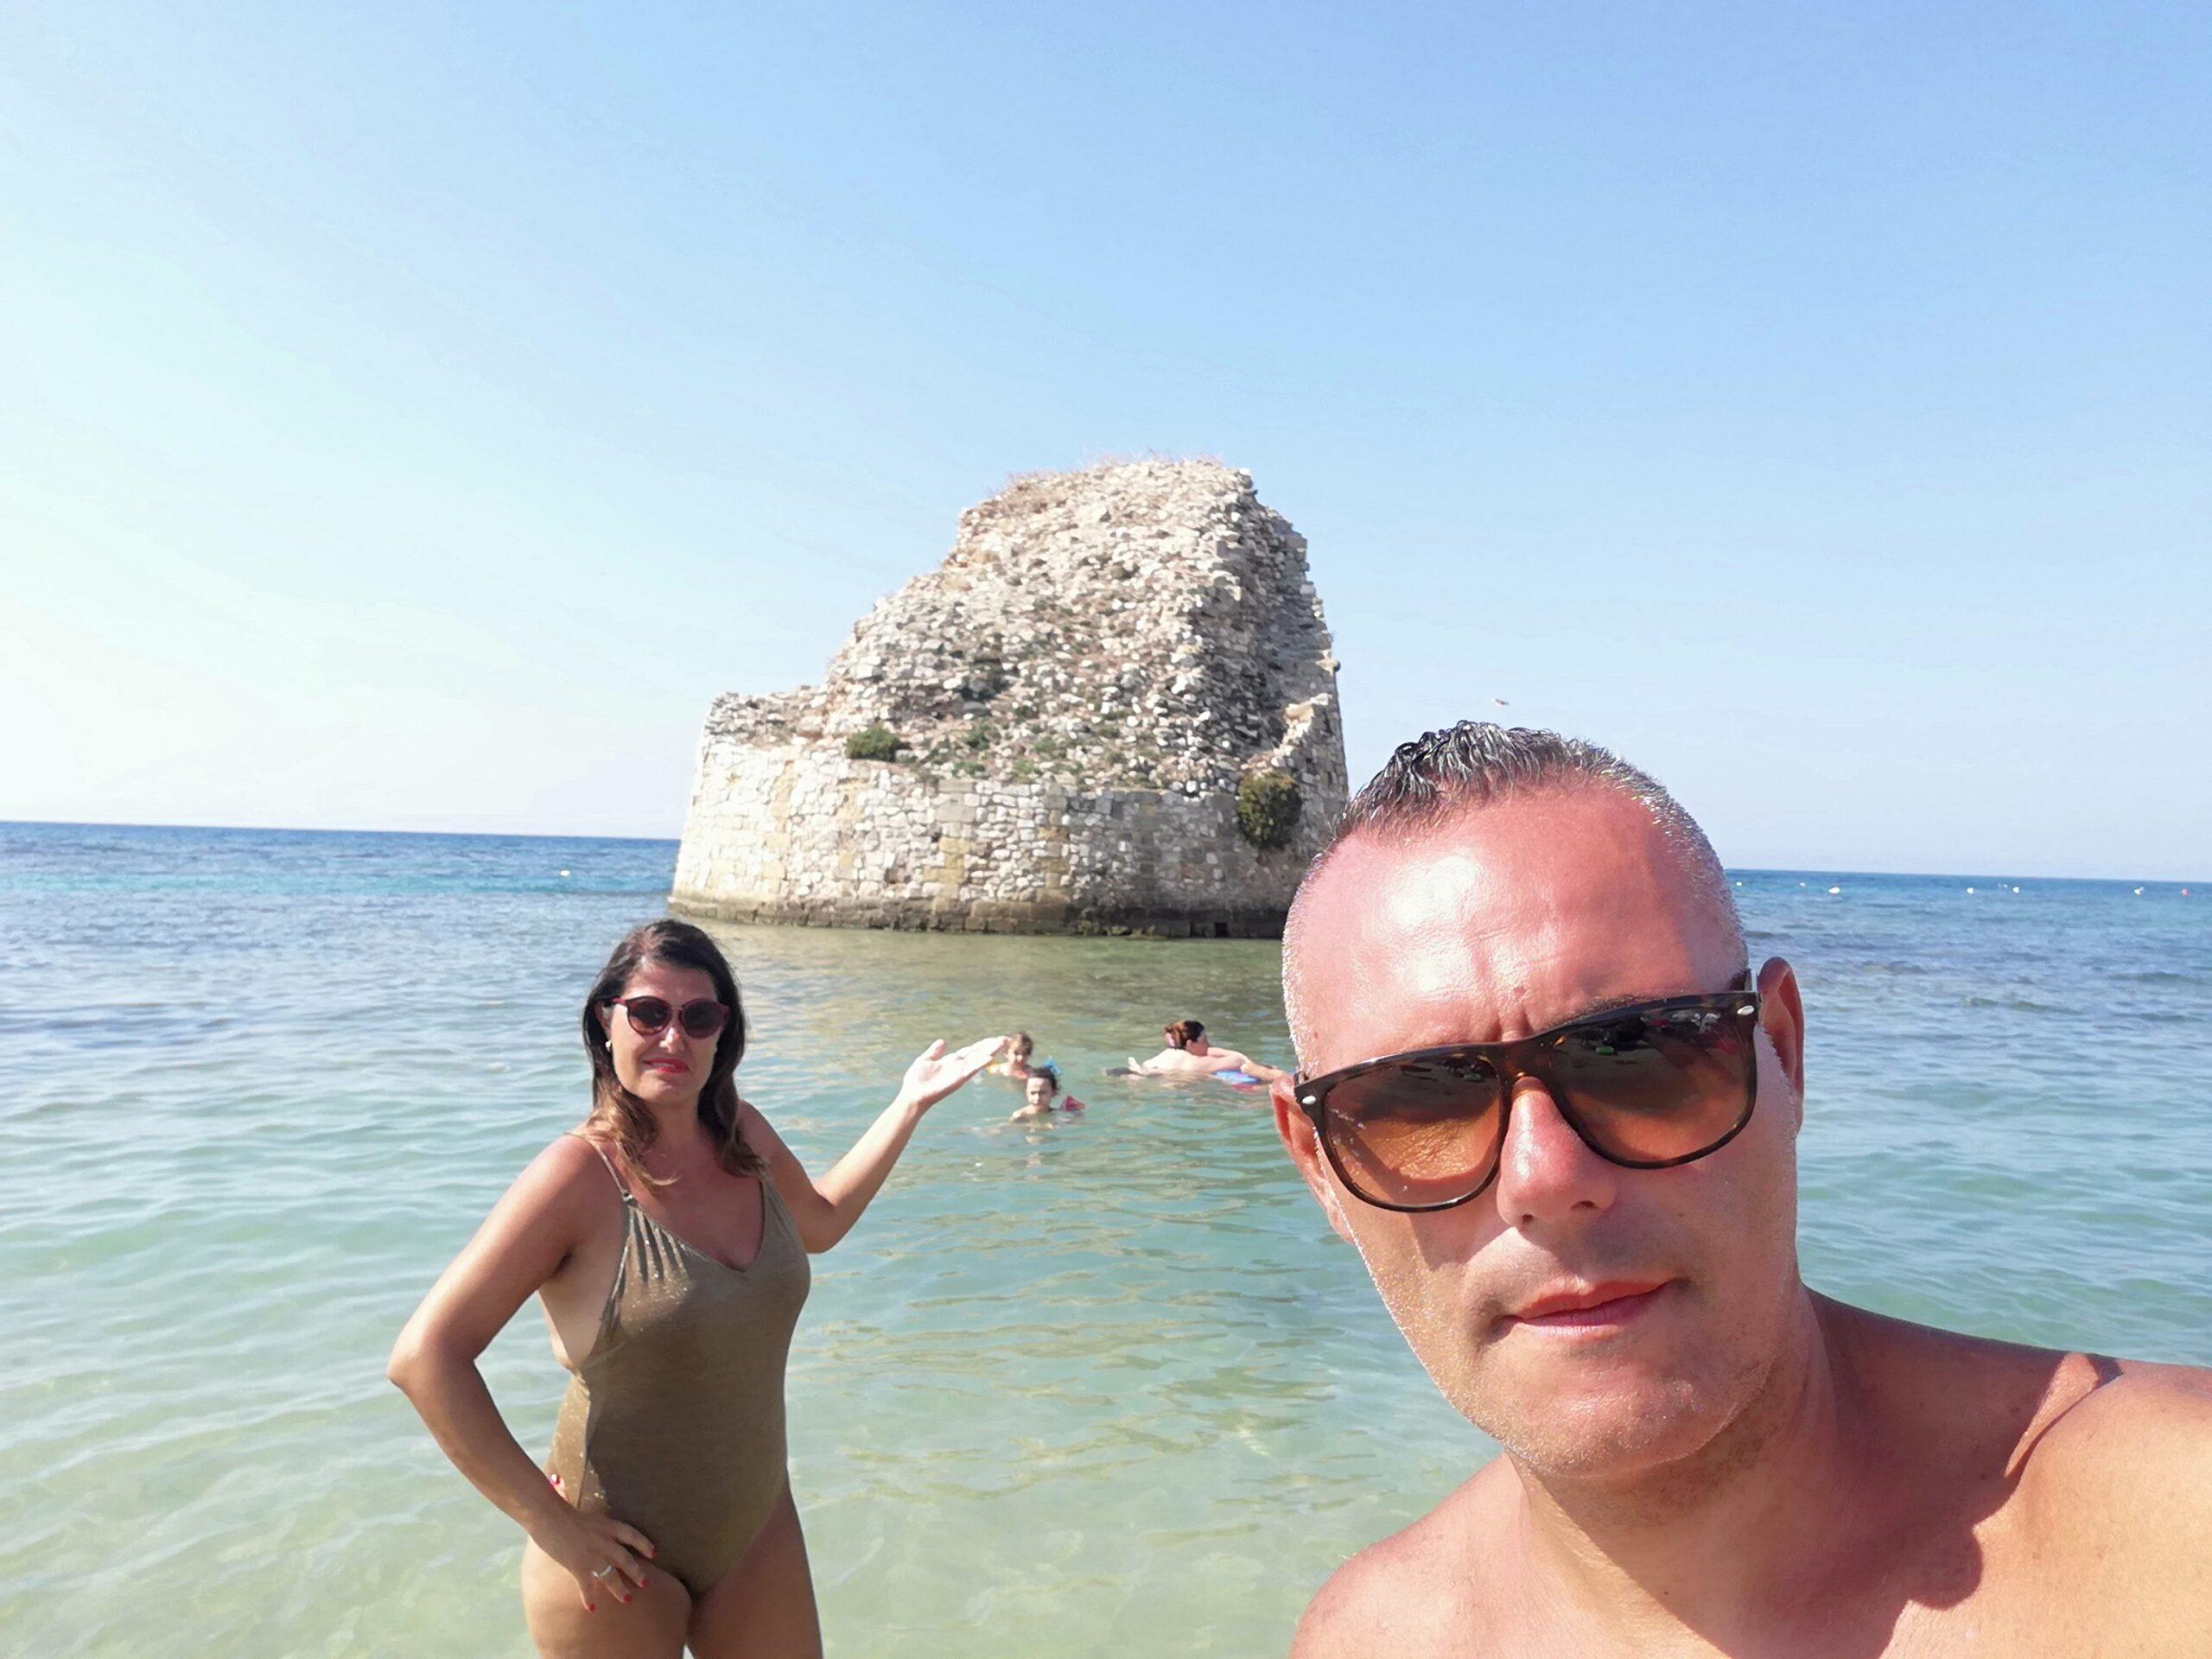 TORRE PALI, Le spiagge del Salento più belle